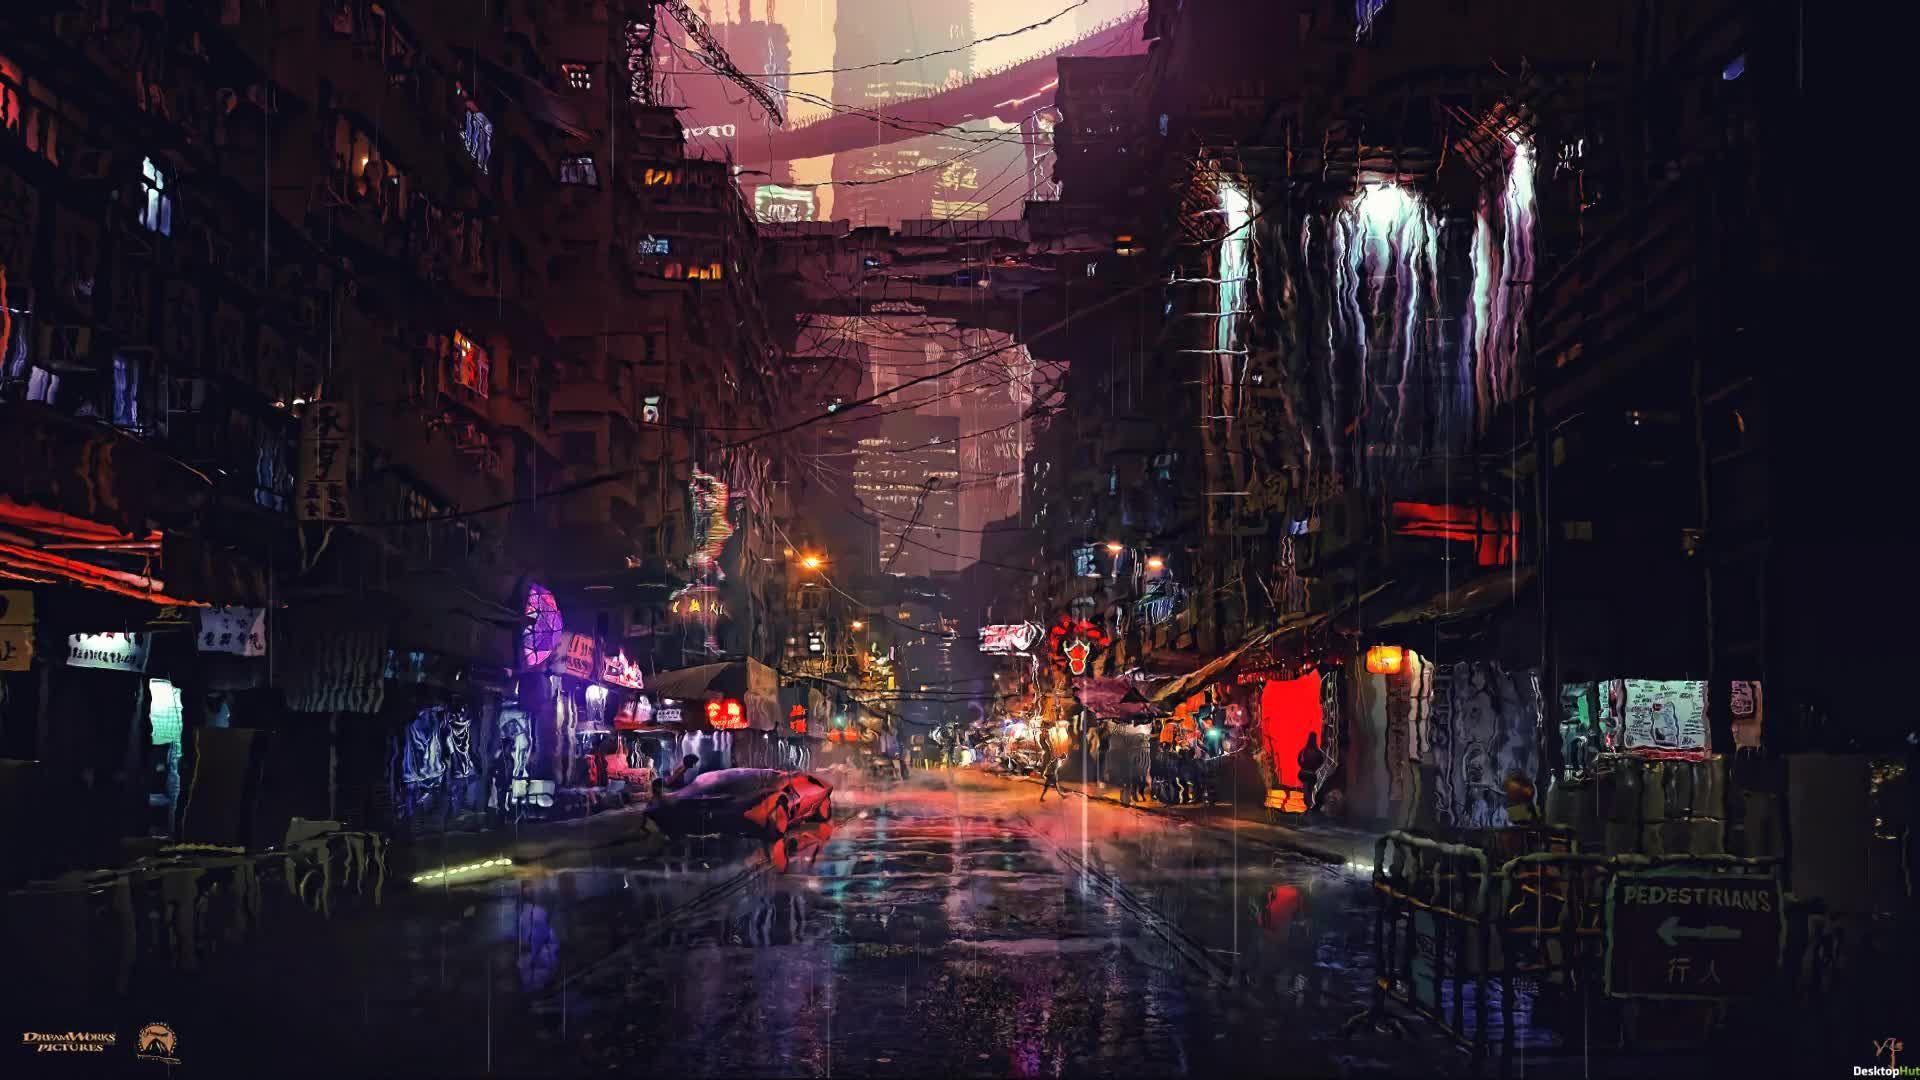 Rain Street 1920x1080 City Lights Wallpaper Futuristic City Digital Wallpaper